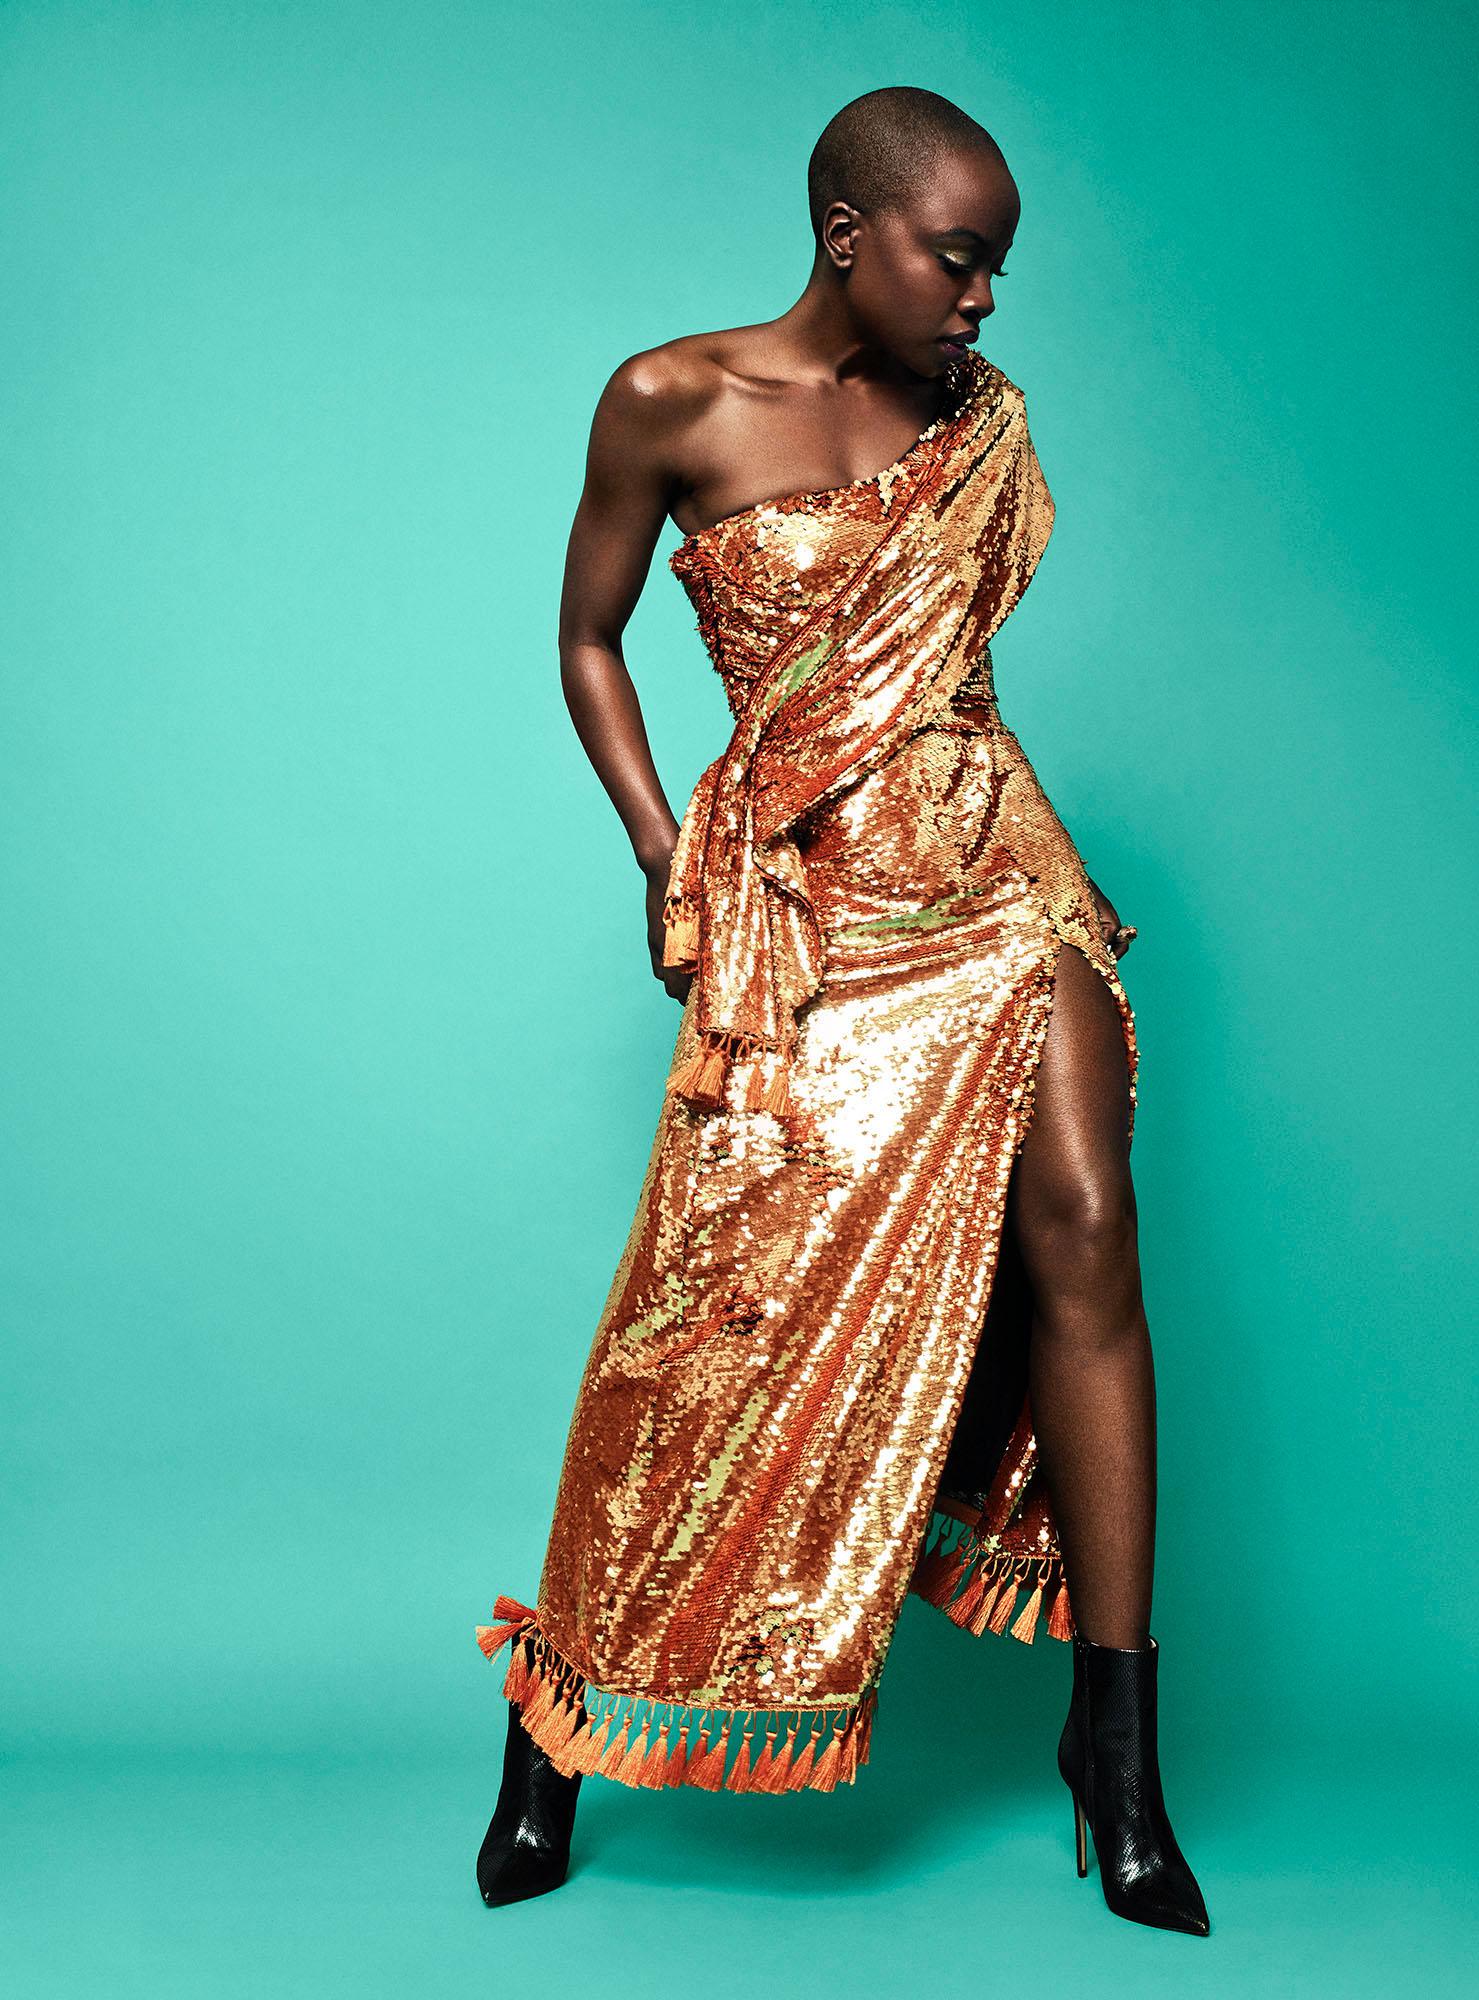 Black Panther's Danai Gurira for ROGUE Magazine